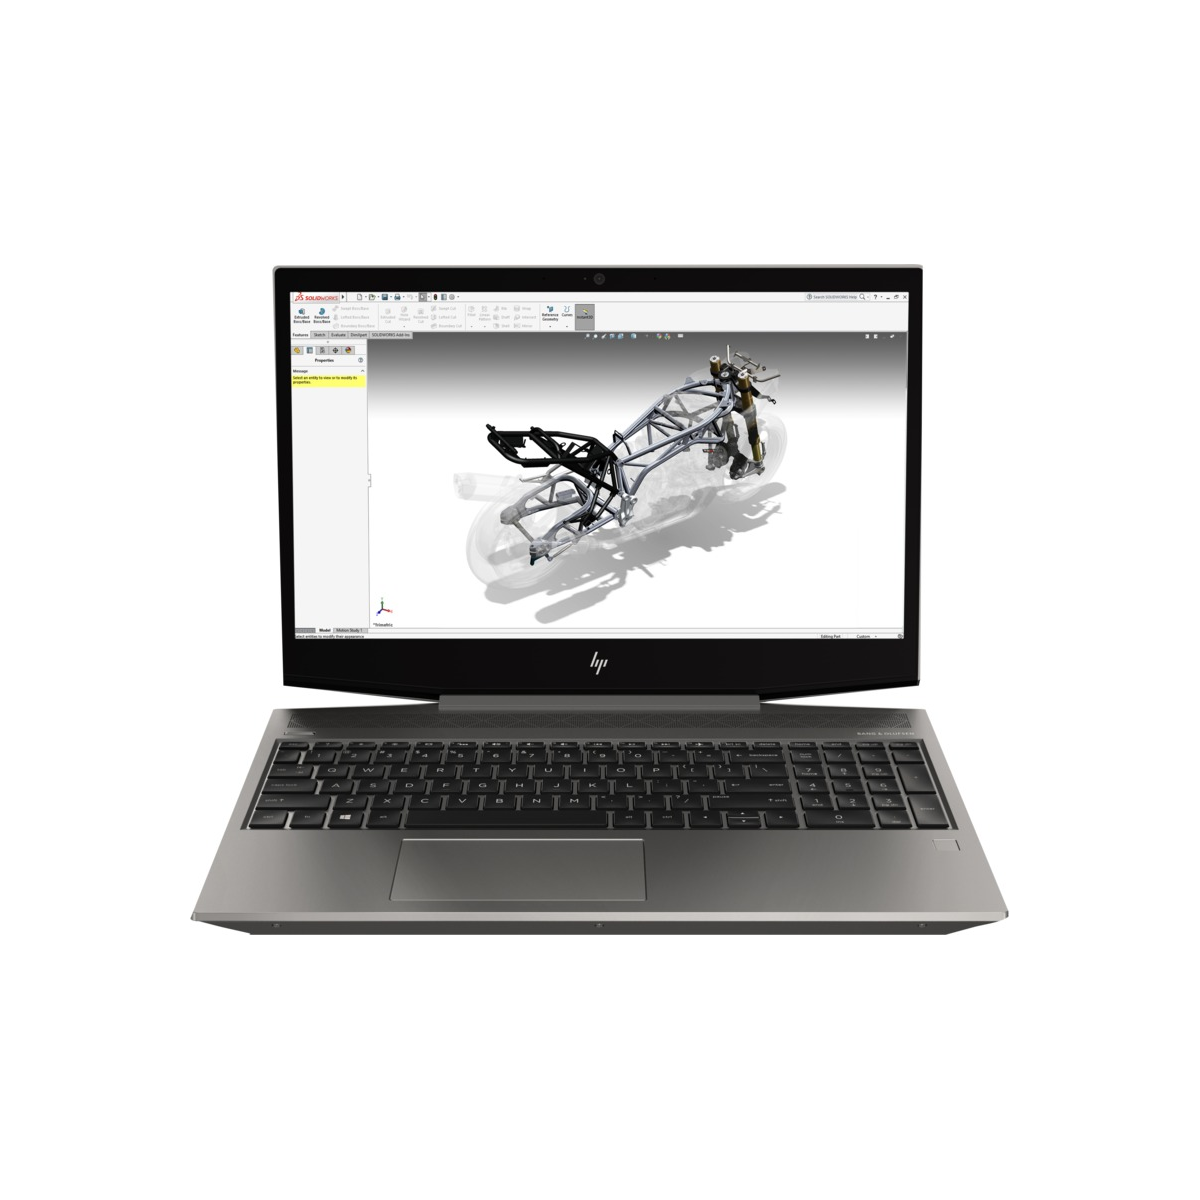 HP Zbook 15v G5 Intel Core i7 8750H Hexa Core RAM 16G SSD 256G 15.6 Windows 10 Pro Nvidia Quadro P600 2 Go HP - 1